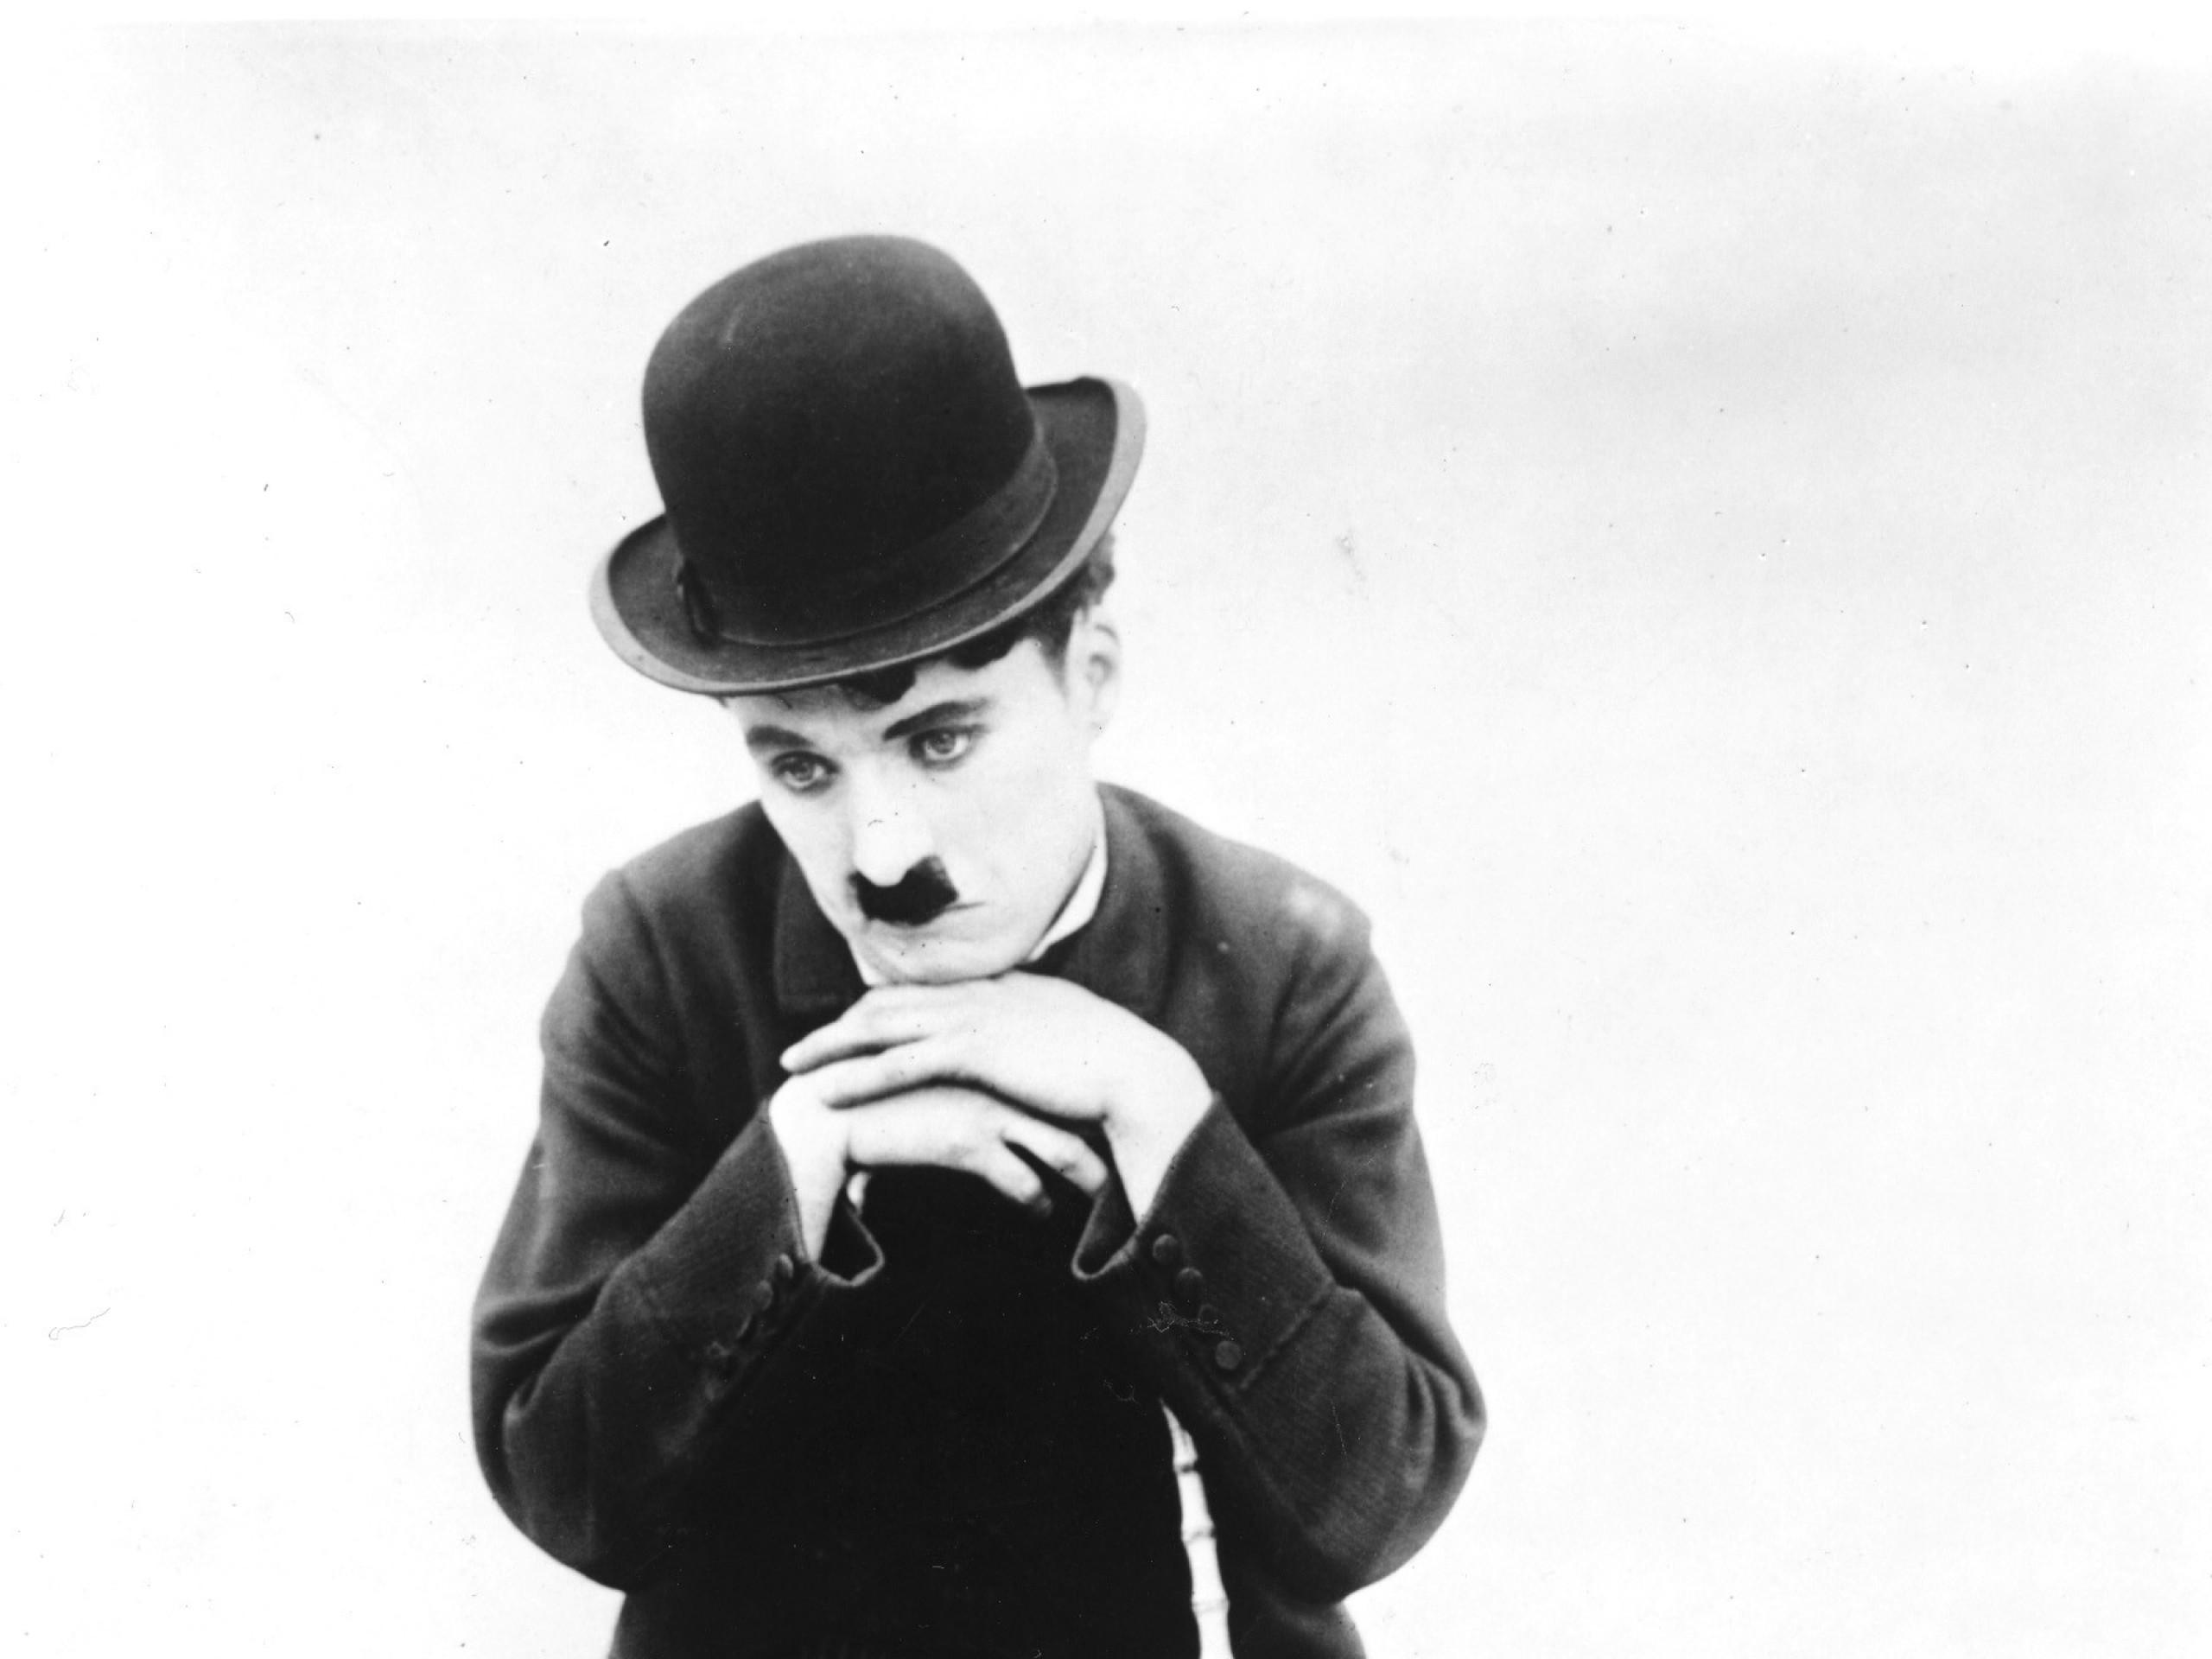 58 Charlie Chaplin Wallpapers on WallpaperPlay 2560x1920